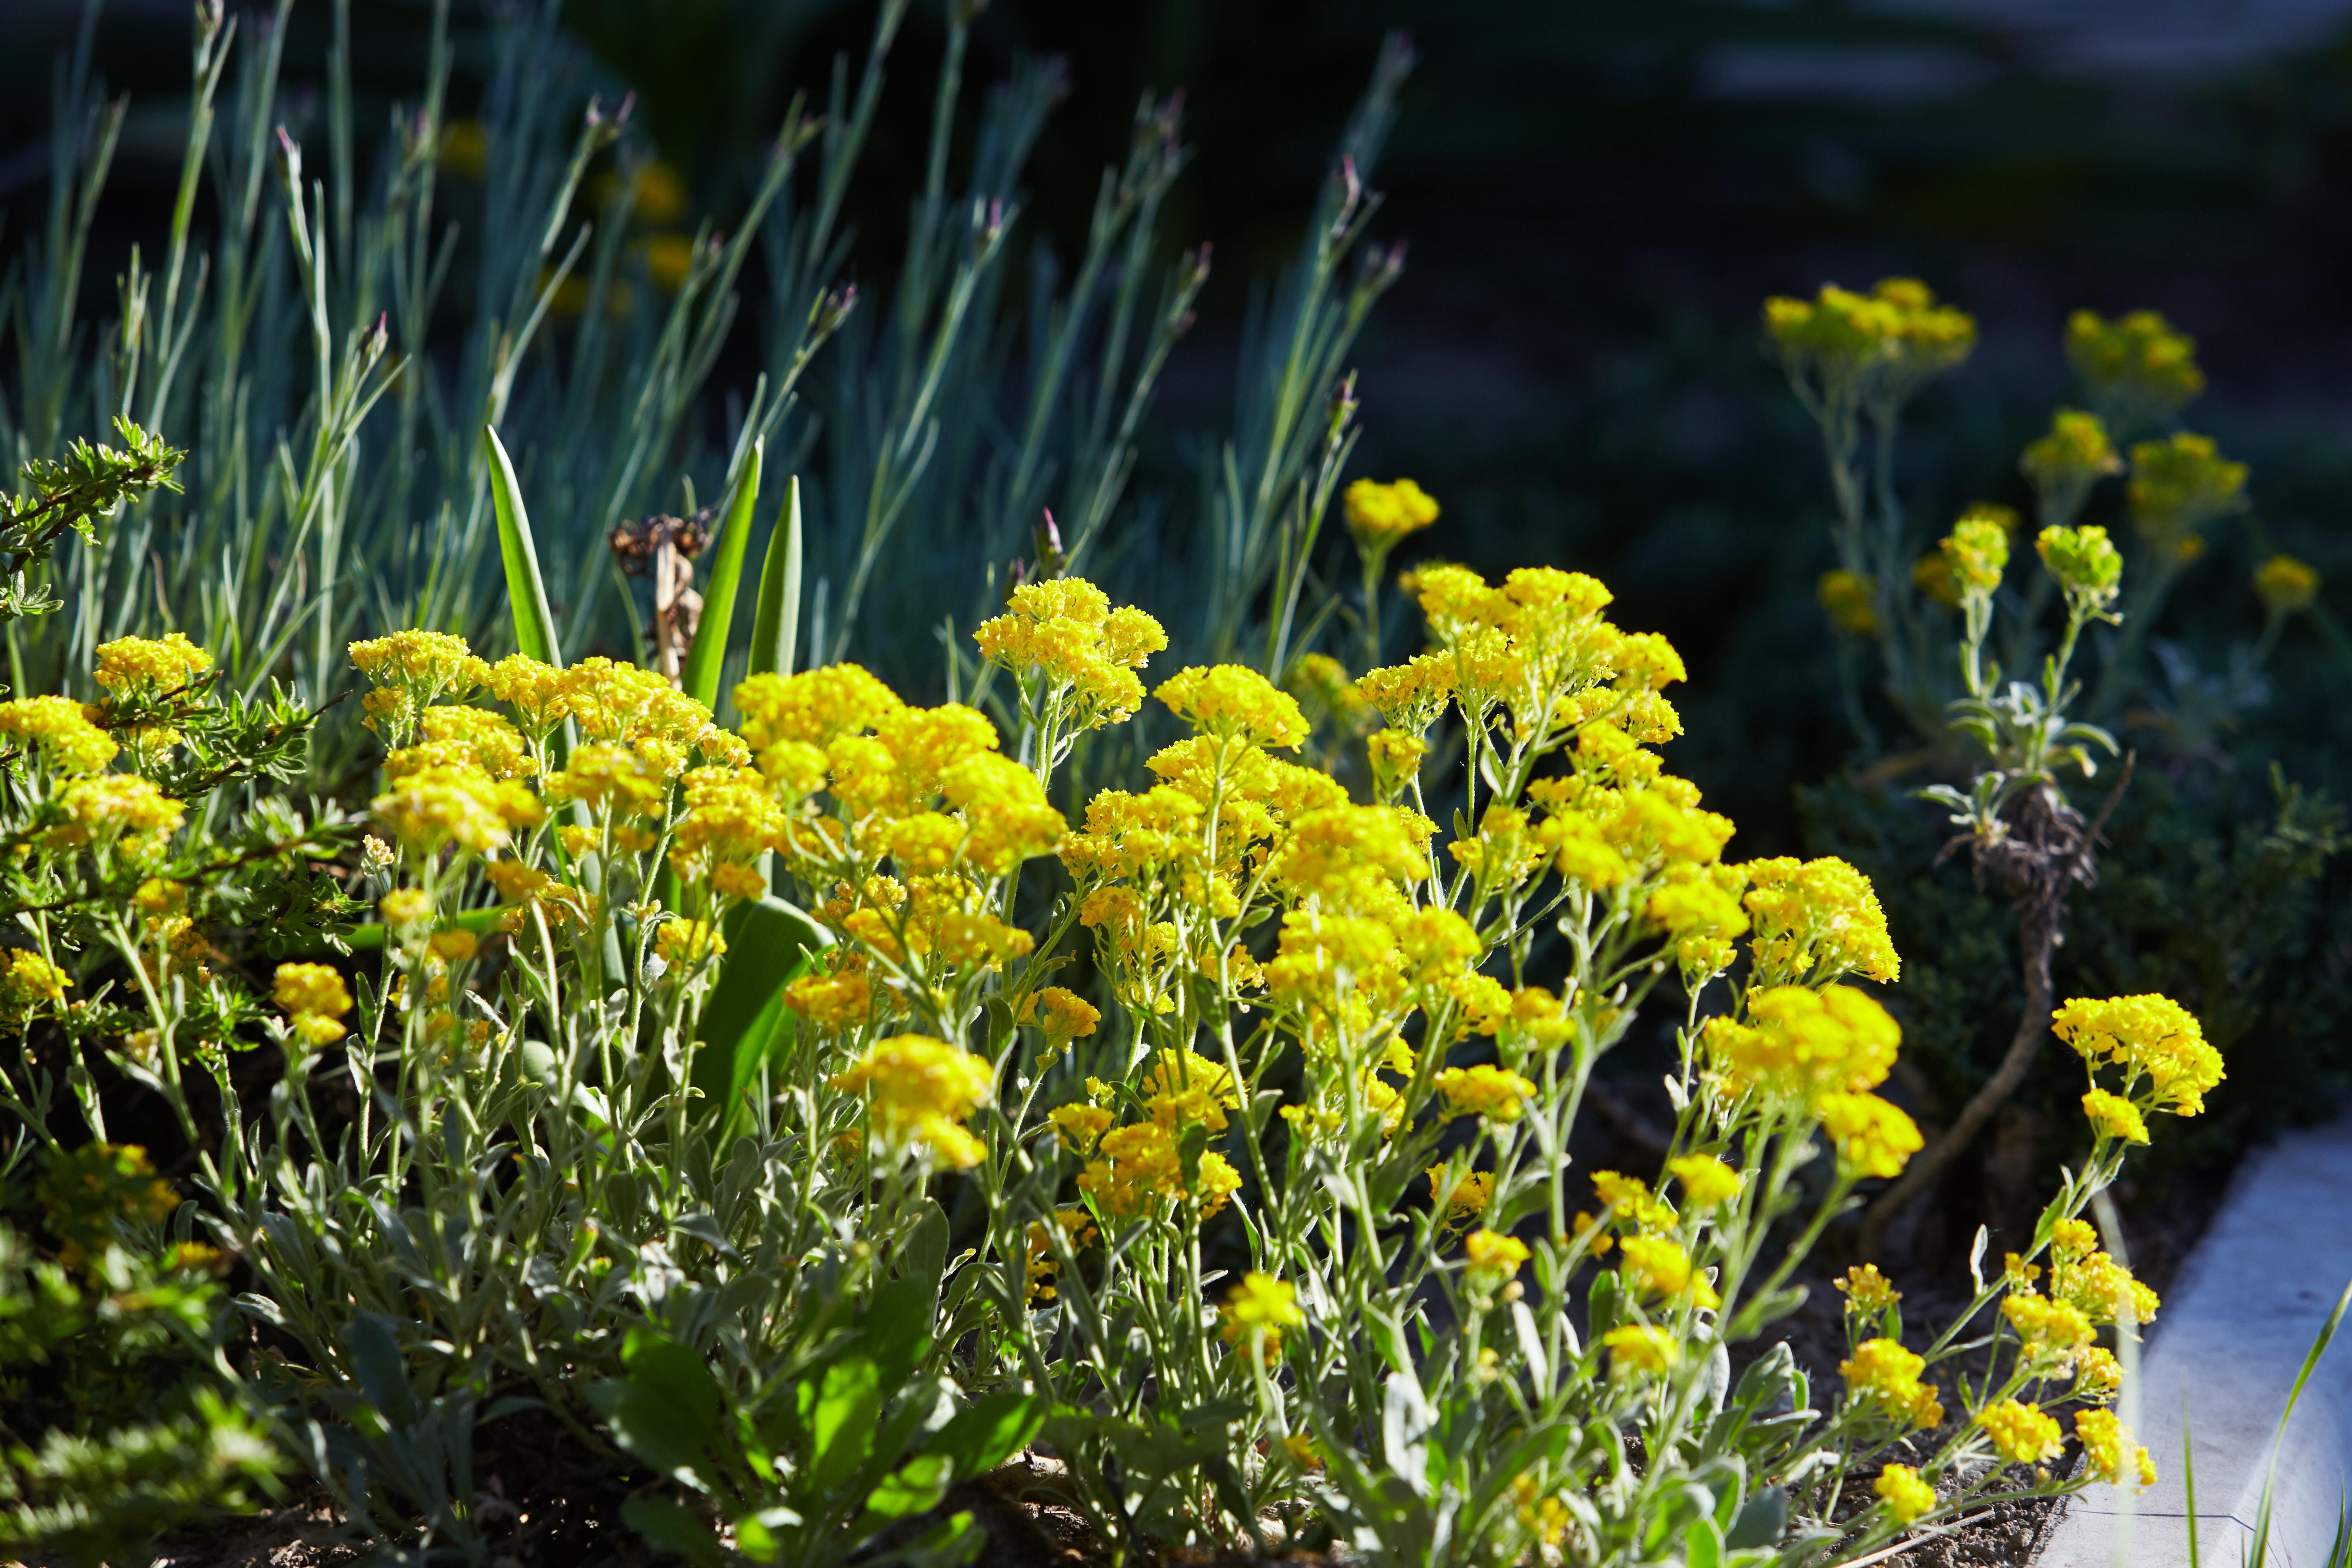 Yellow flowers of helichrysum arenarium immortelle on green blurry background